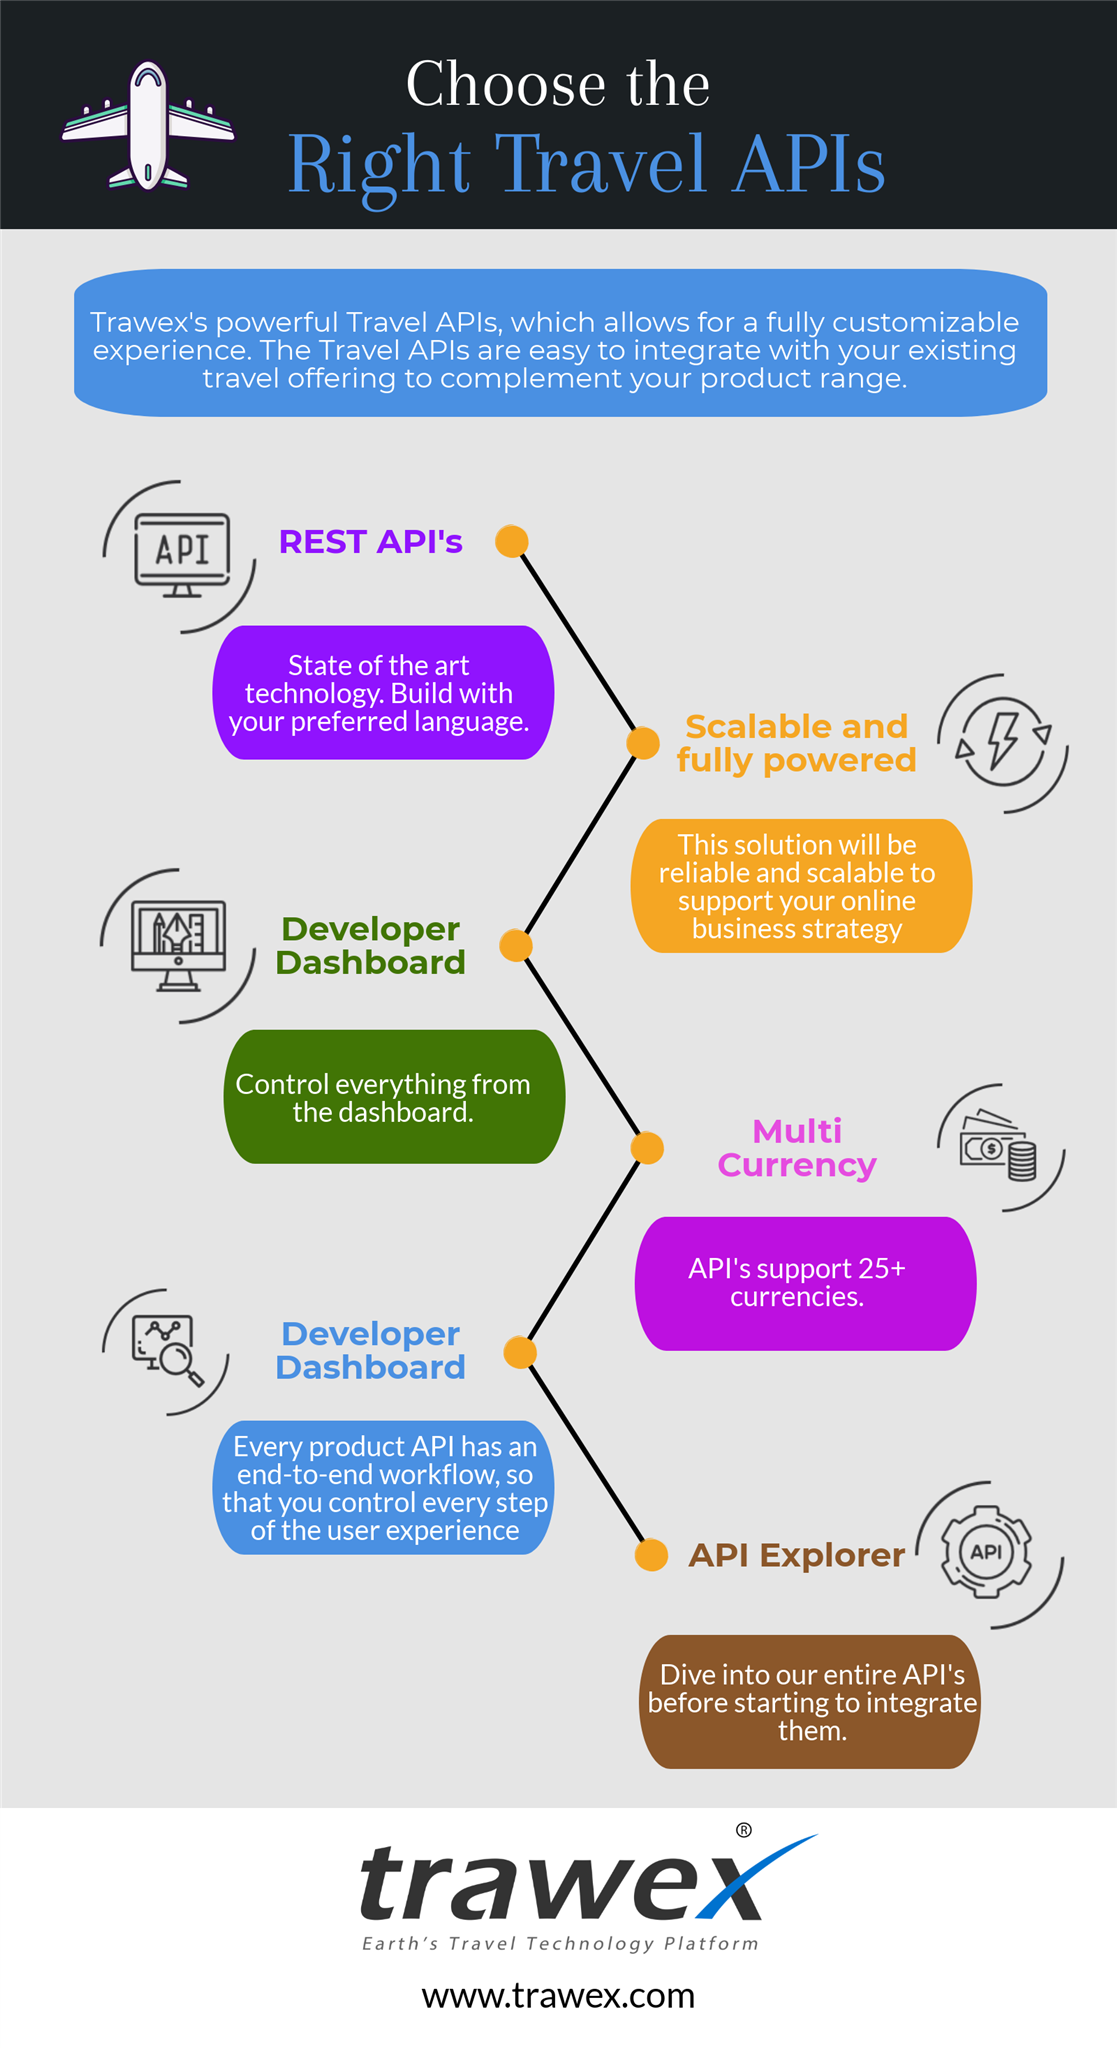 What travel APIs provide affiliate commissions? - Quora